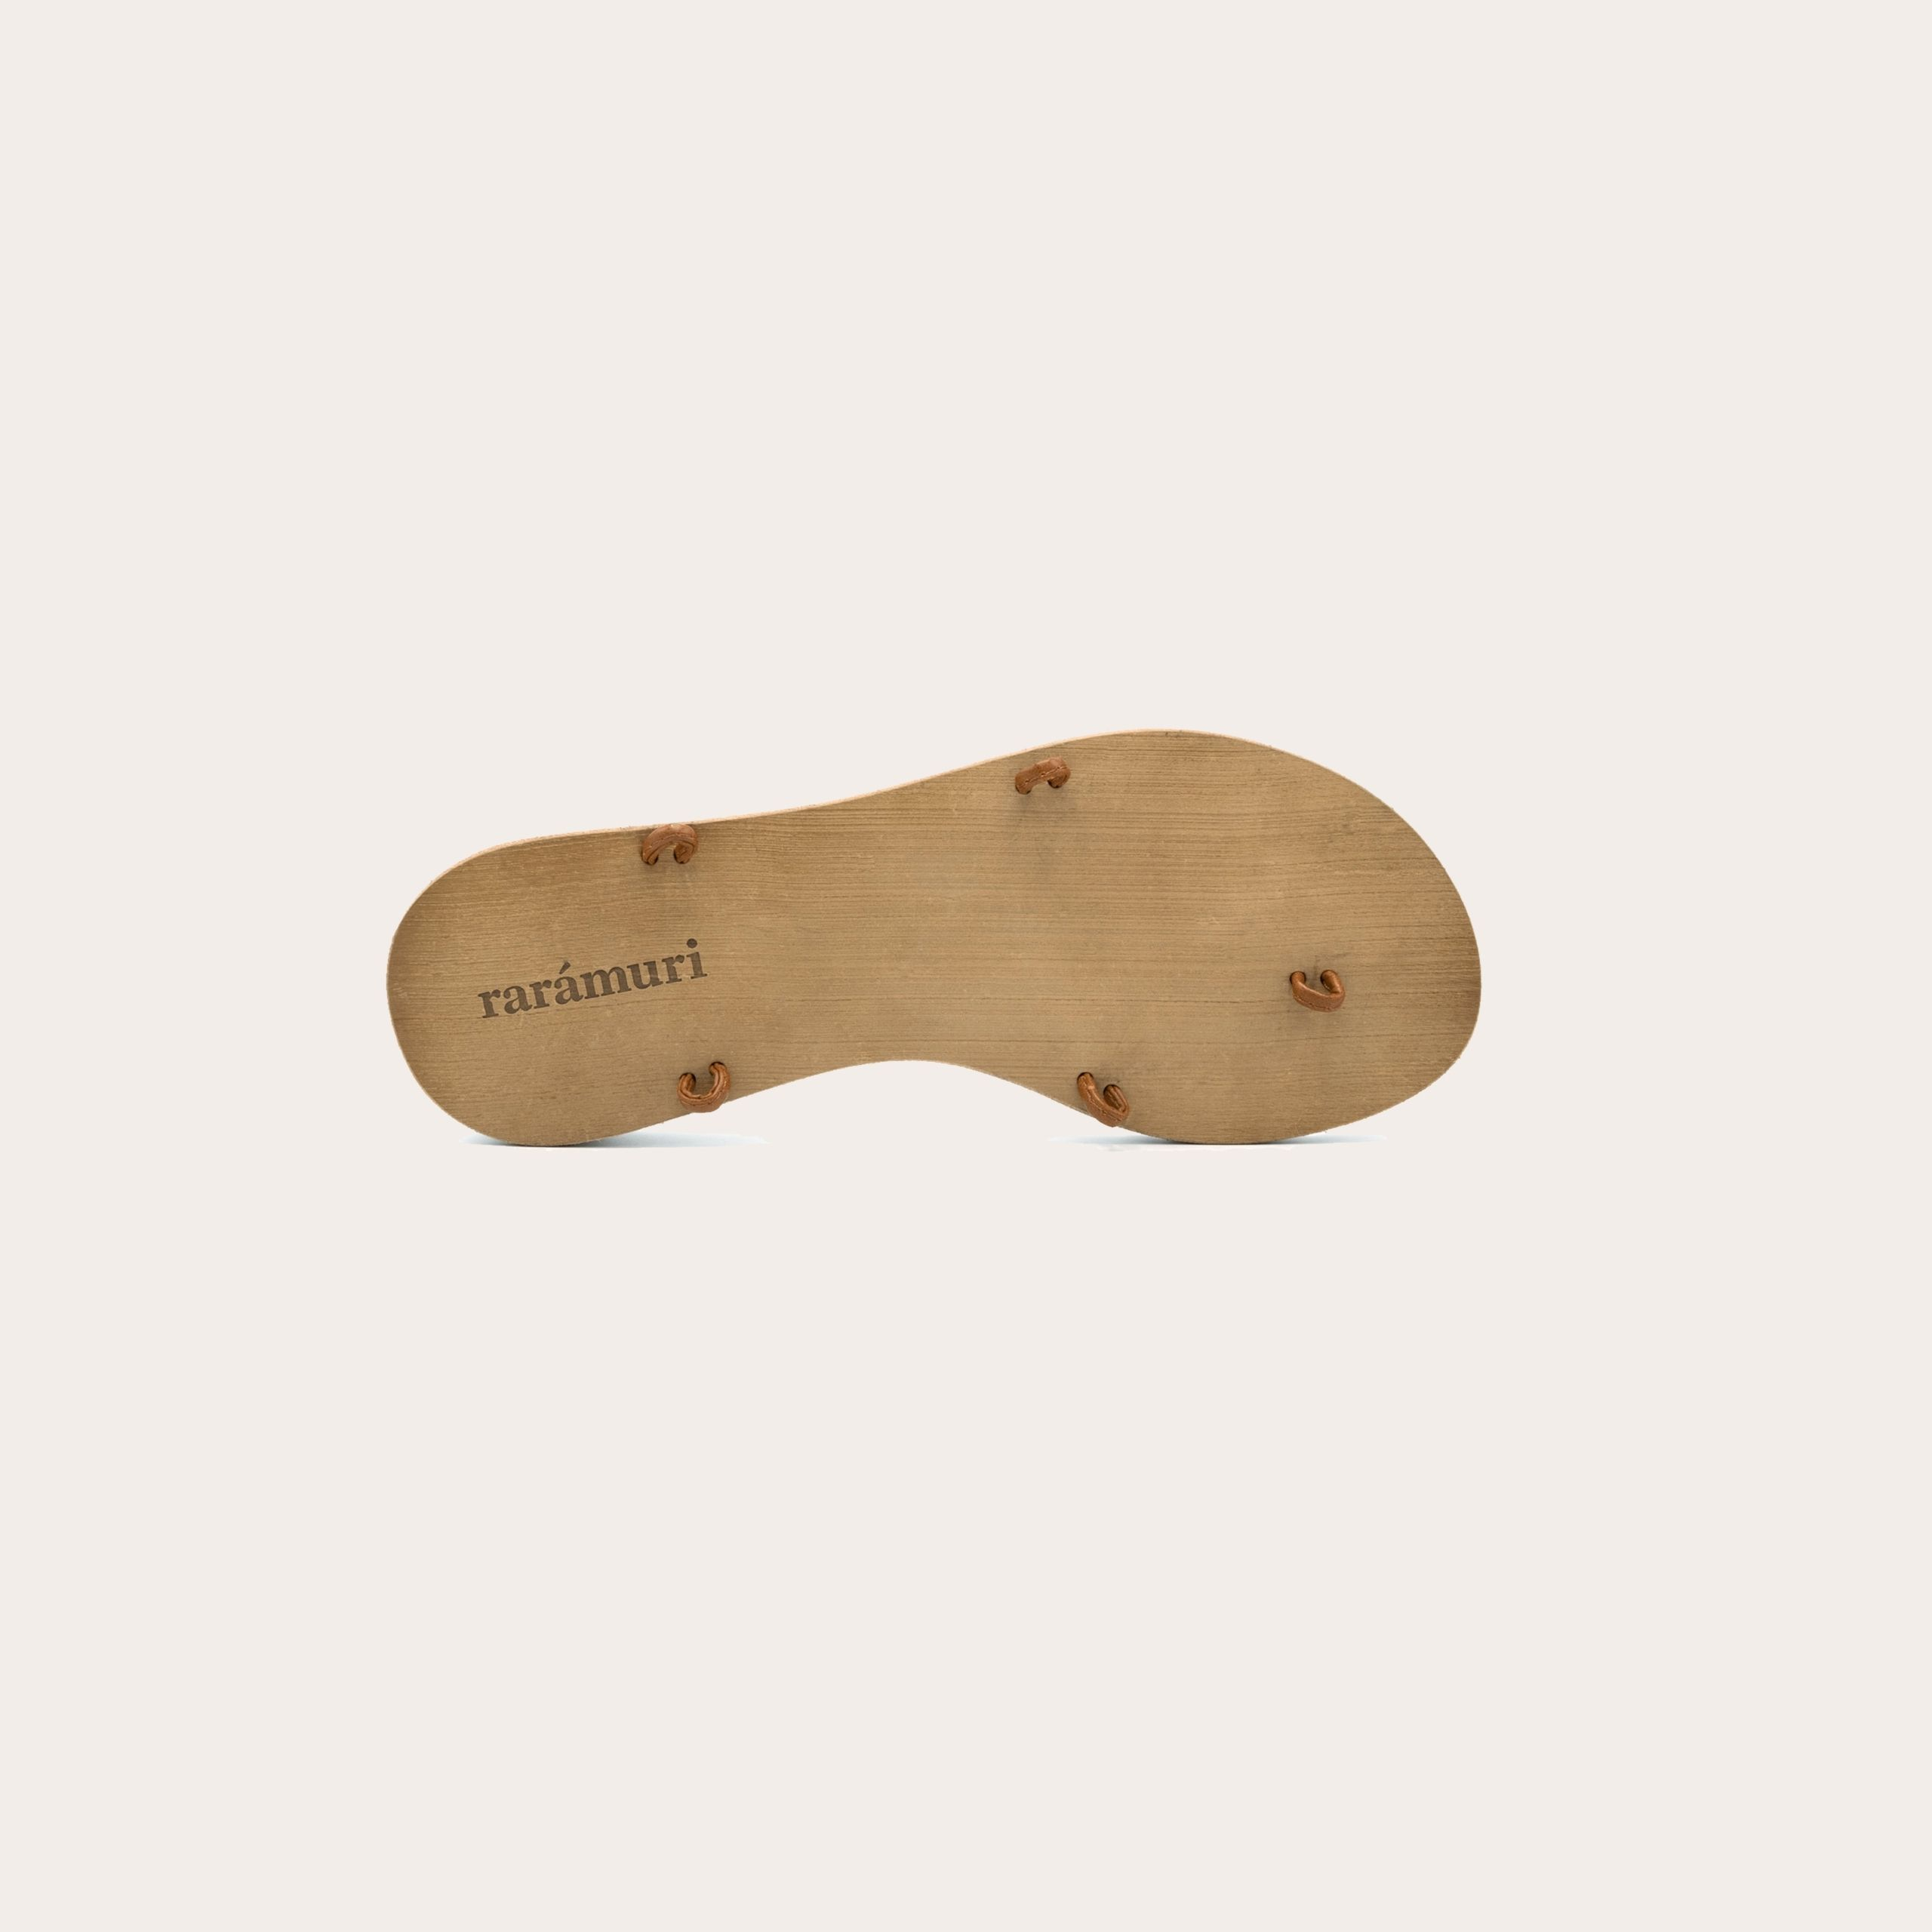 chalco-3_lintsandalen sandals travelsandals vegan sustainable sandals wikkelsandalen